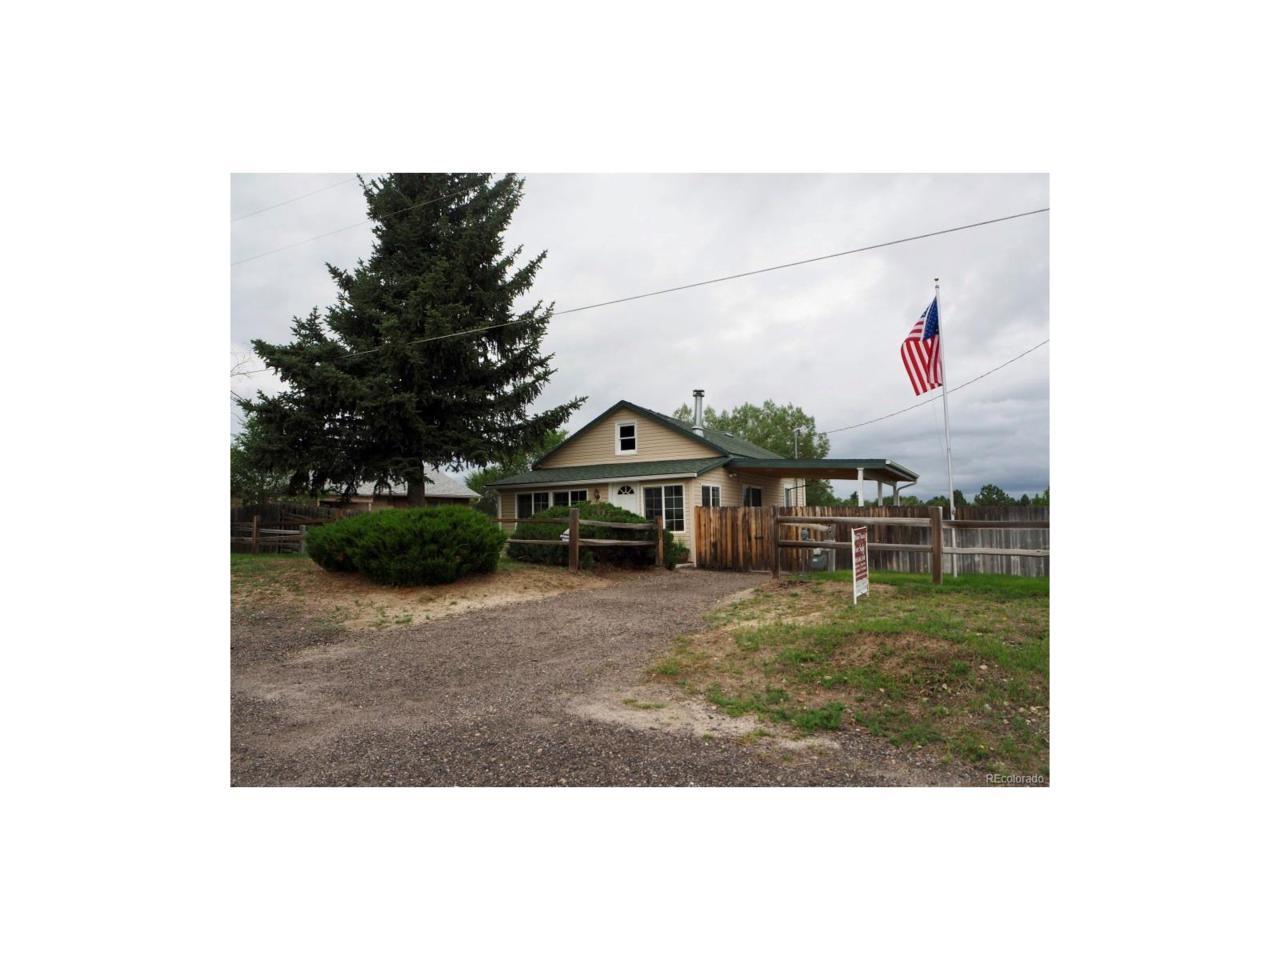 133 E Chestnut Street, Elizabeth, CO 80107 (MLS #2252323) :: 8z Real Estate